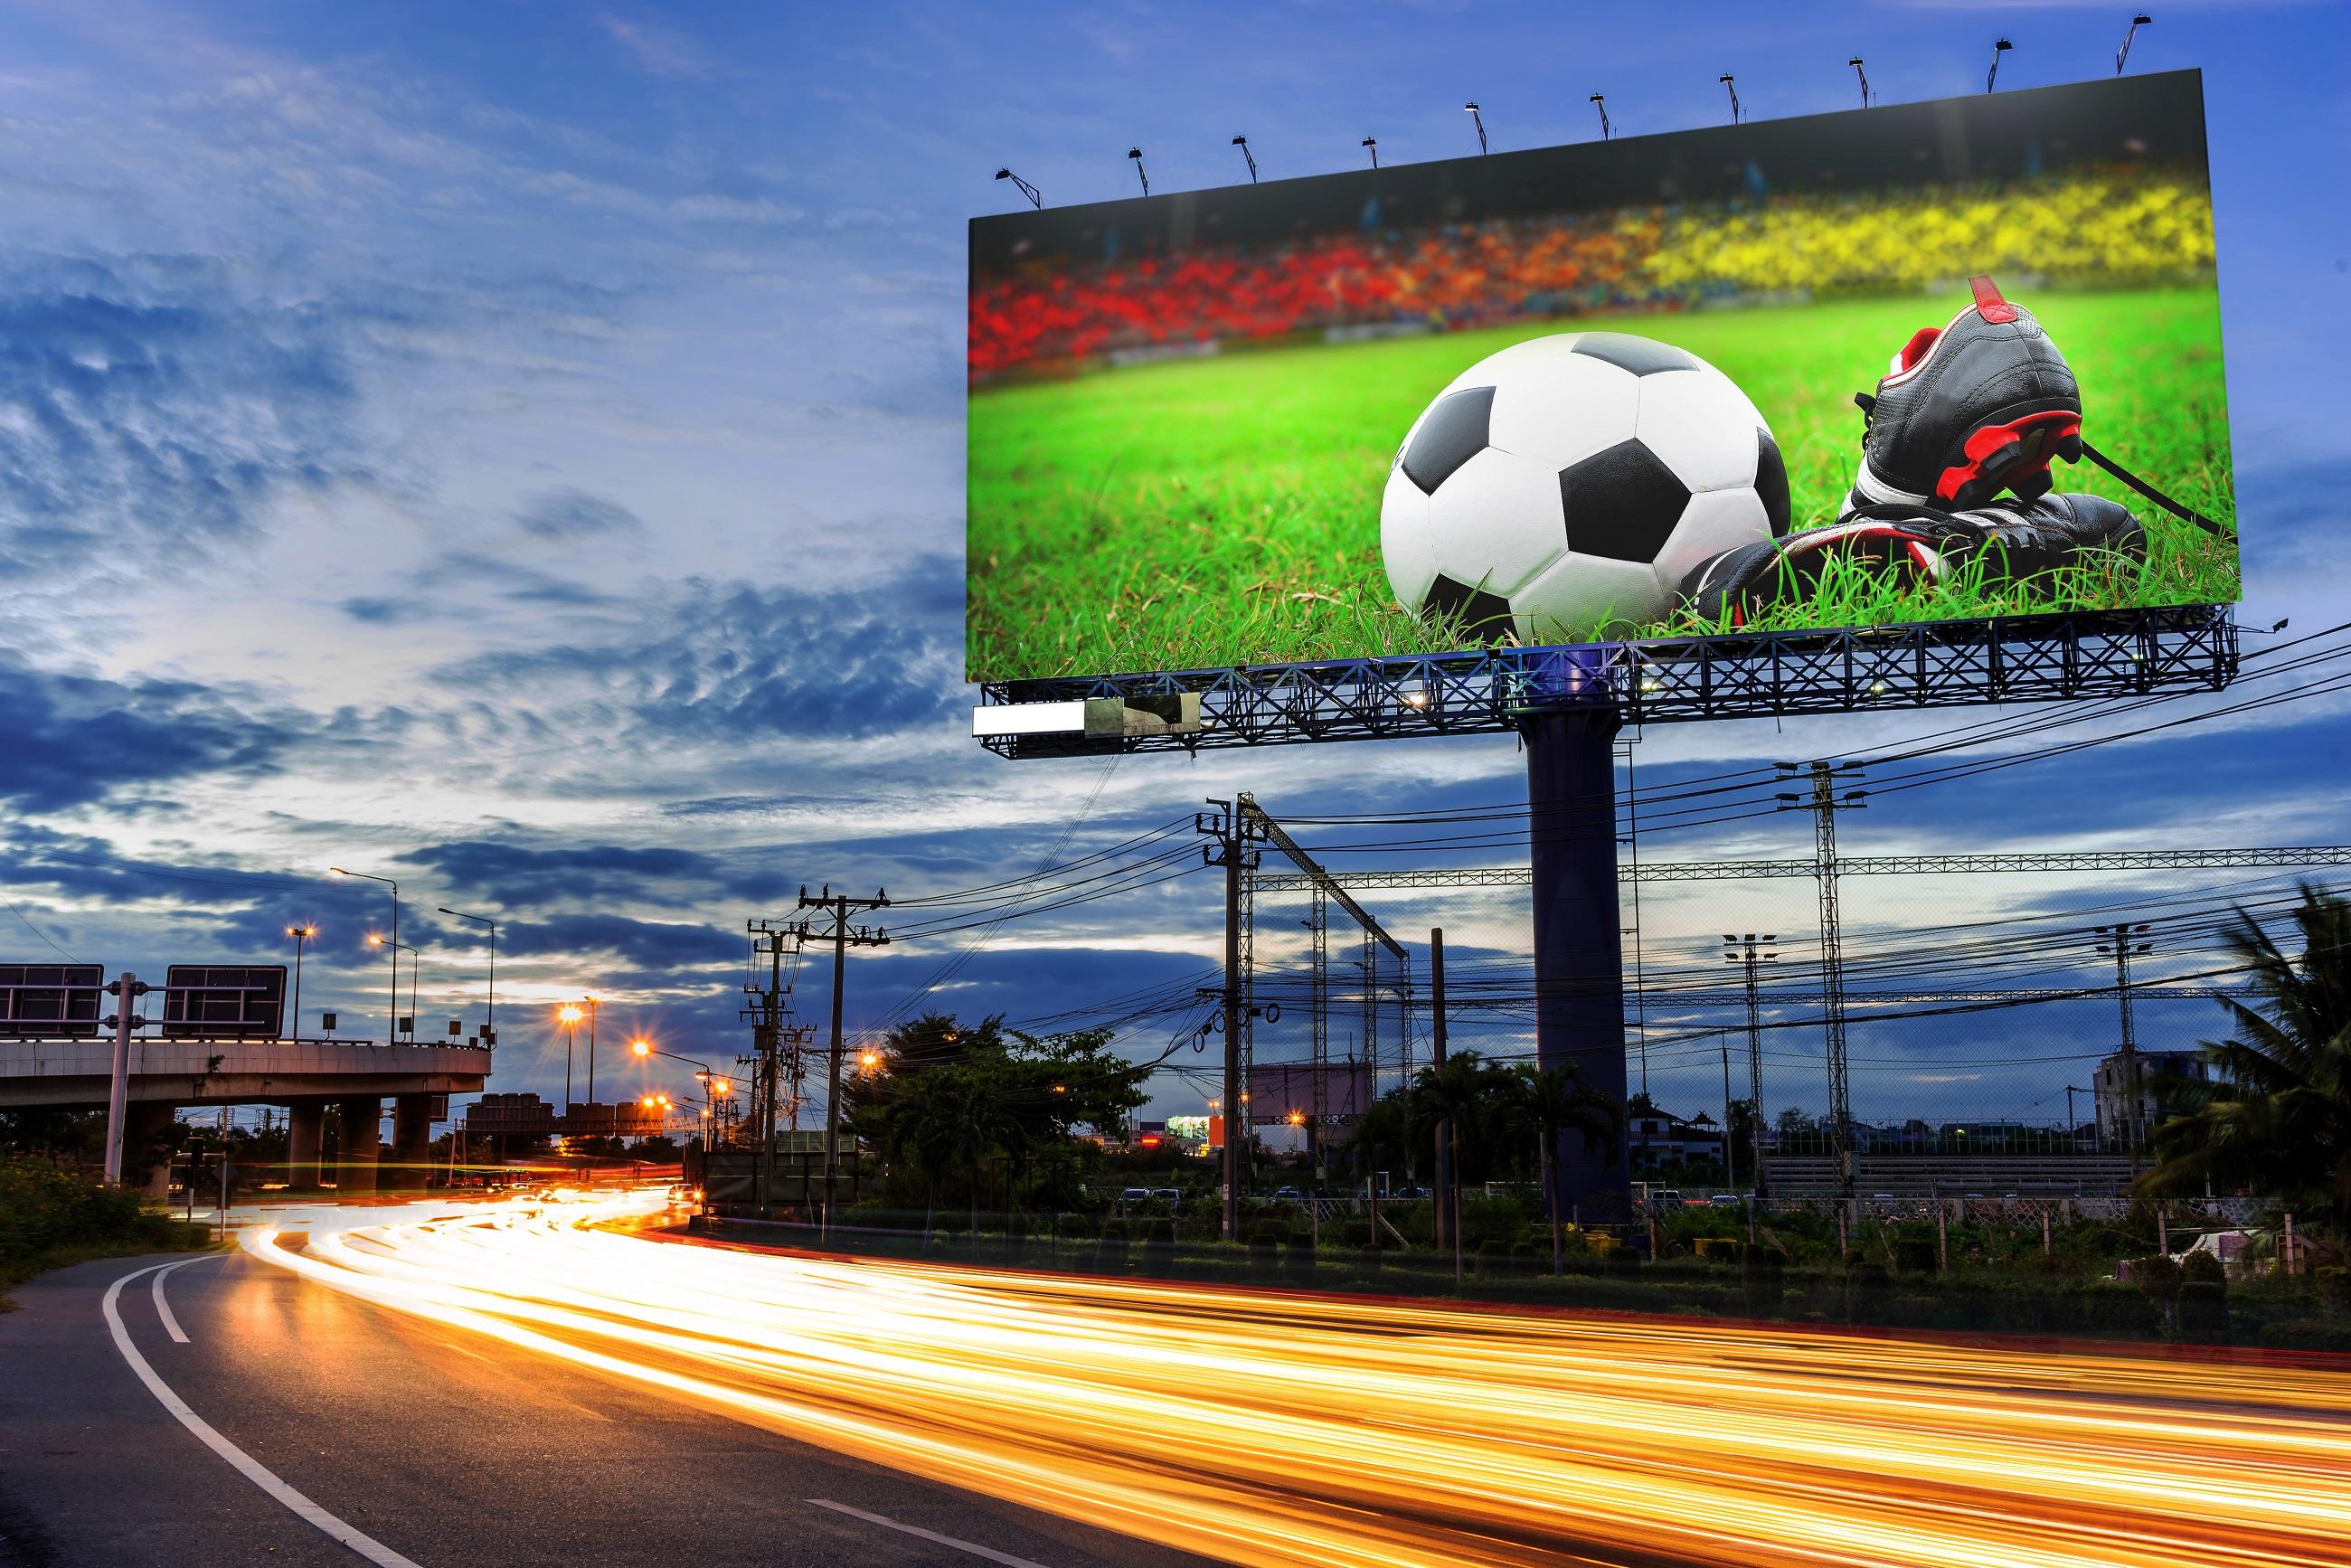 World cup 2018: Marketing dream or nightmare?